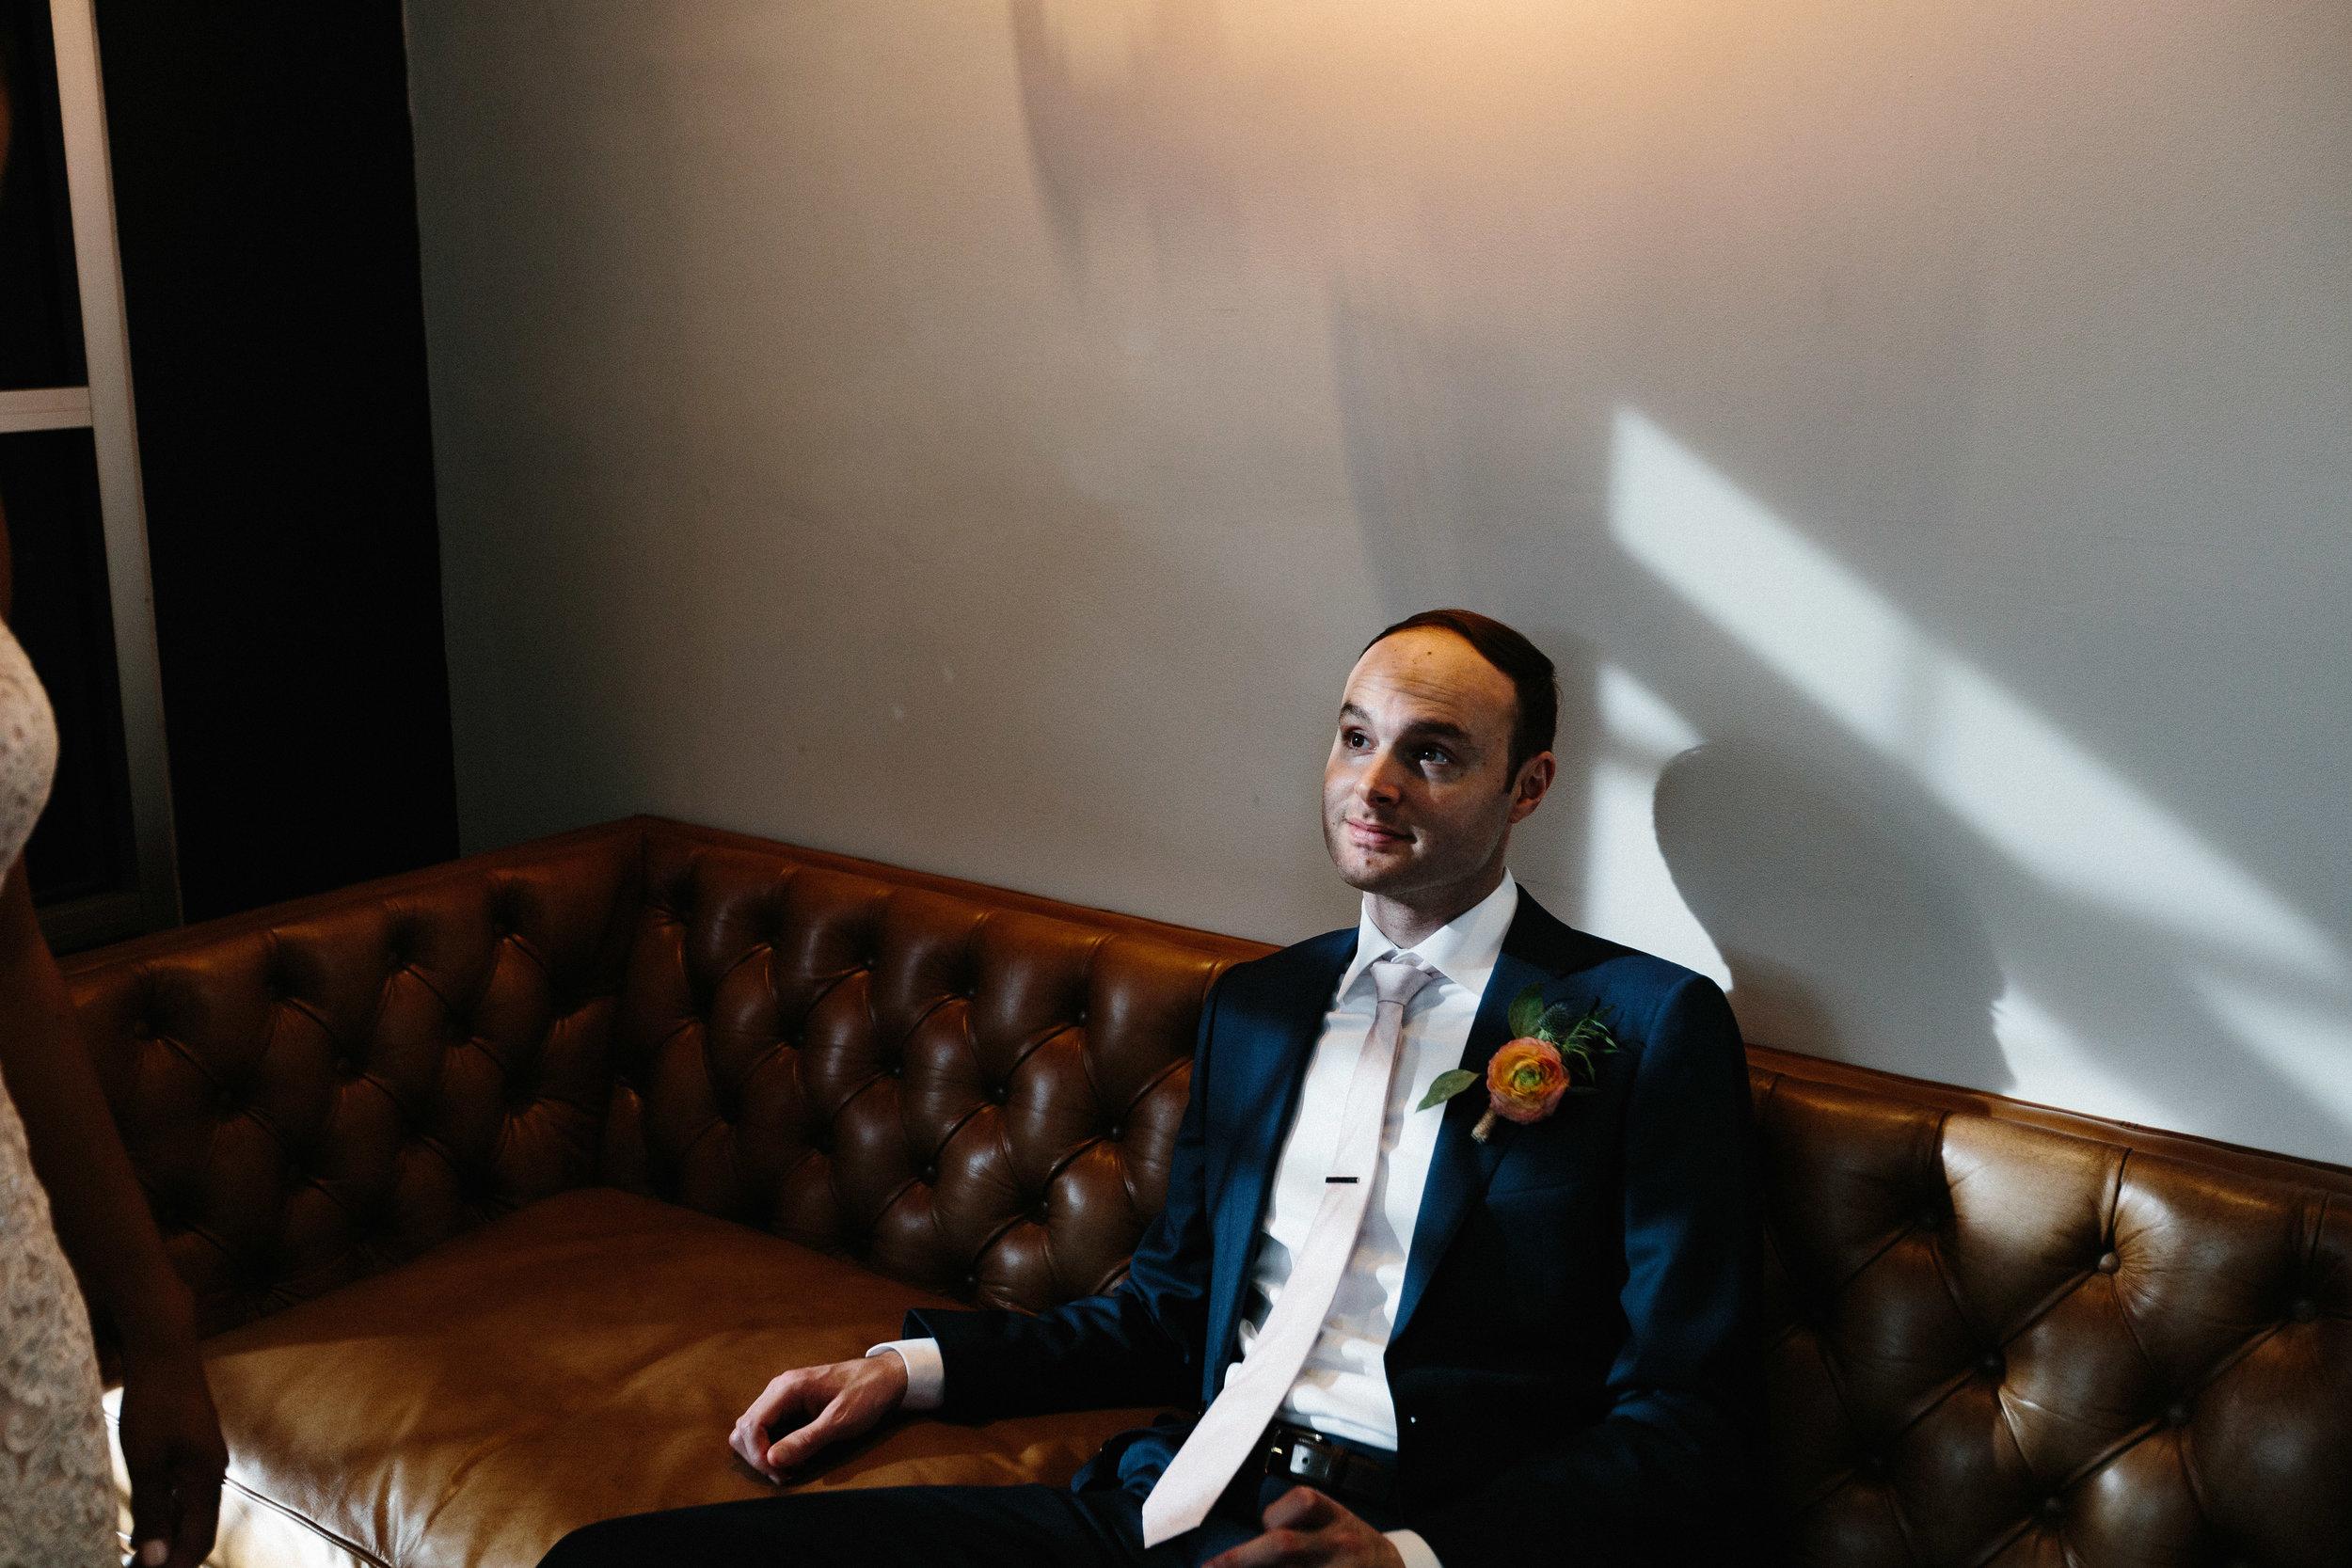 king_plow_atlanta_wedding_art_gallery_modern_lifestyle_documentary_1659.jpg